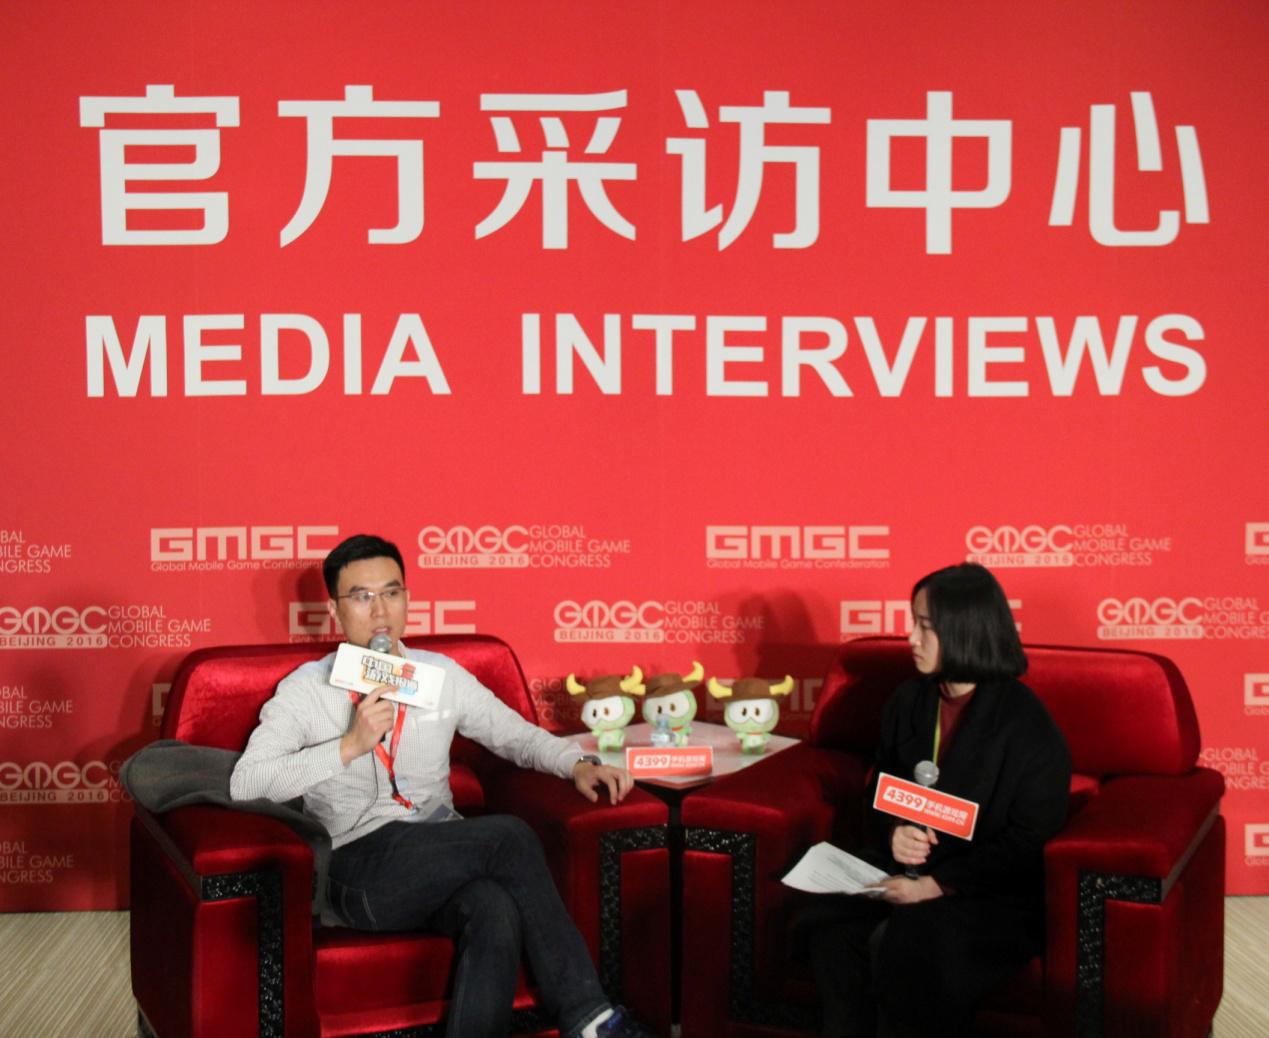 GMGC 2016 | R2Games VP唐桑田专访:从运营商角度看中国手游应该如何出海